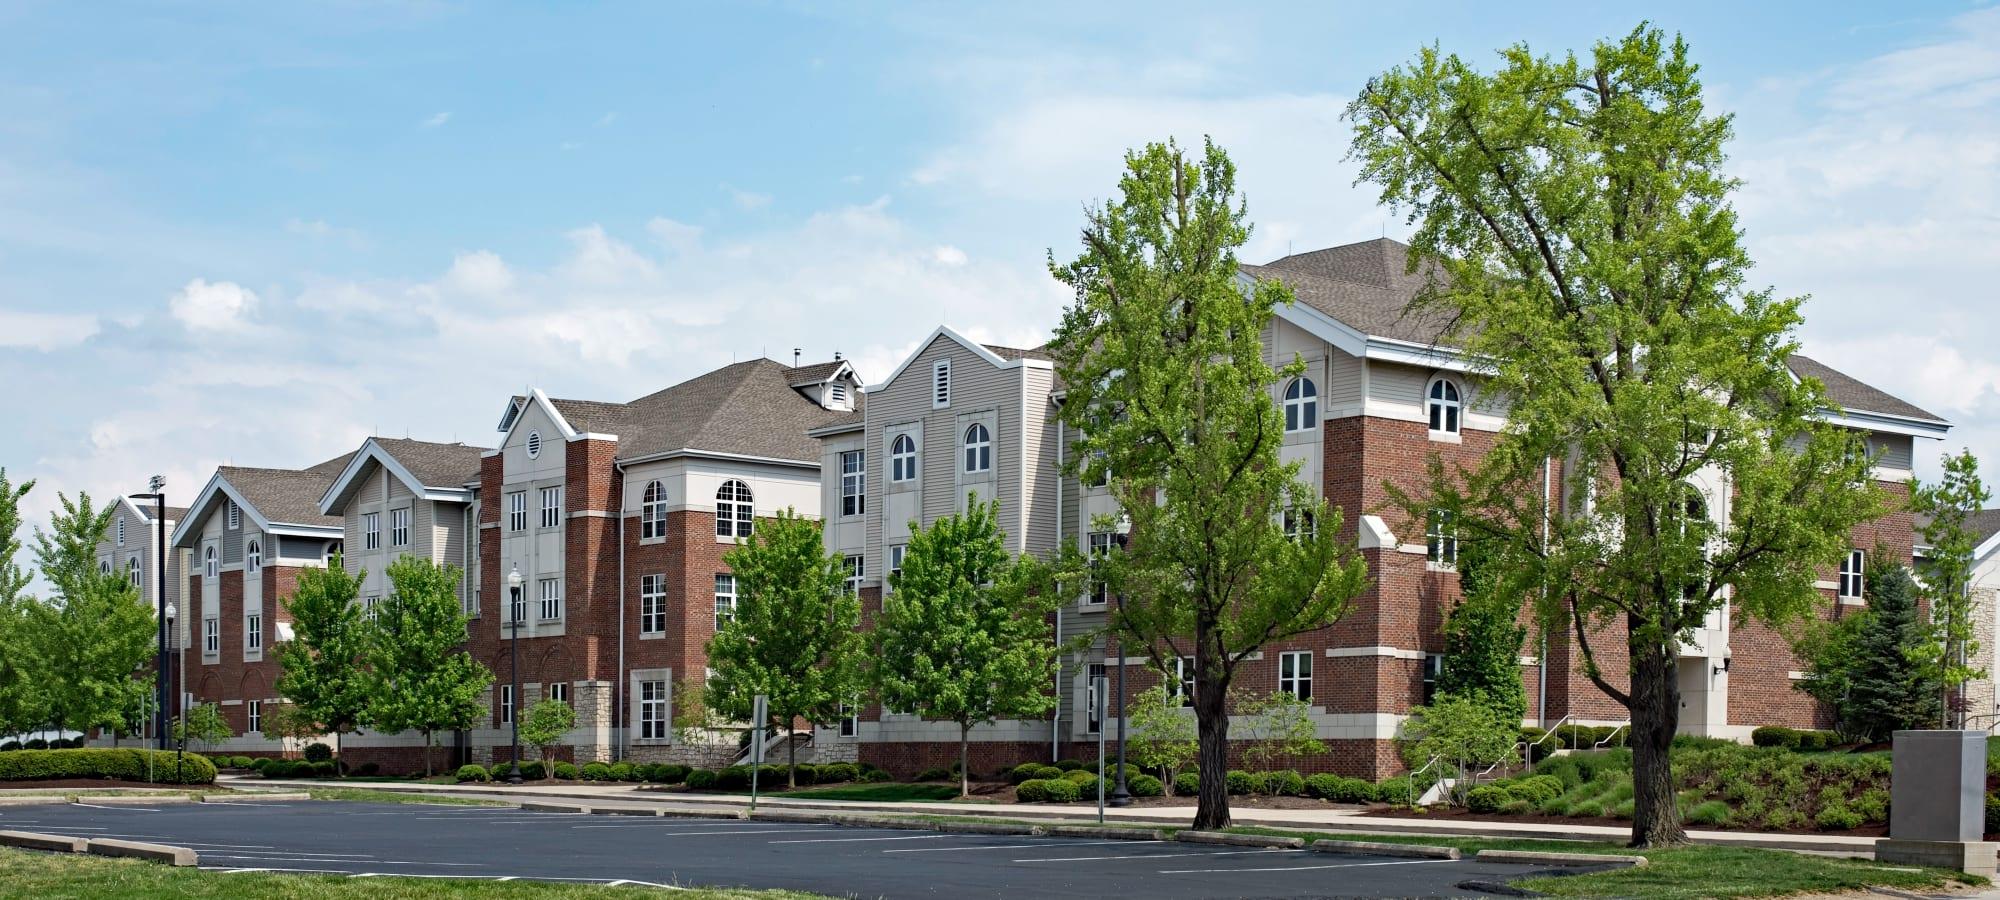 Apartments with Berkley Properties, LLC in Lakewood, New Jersey